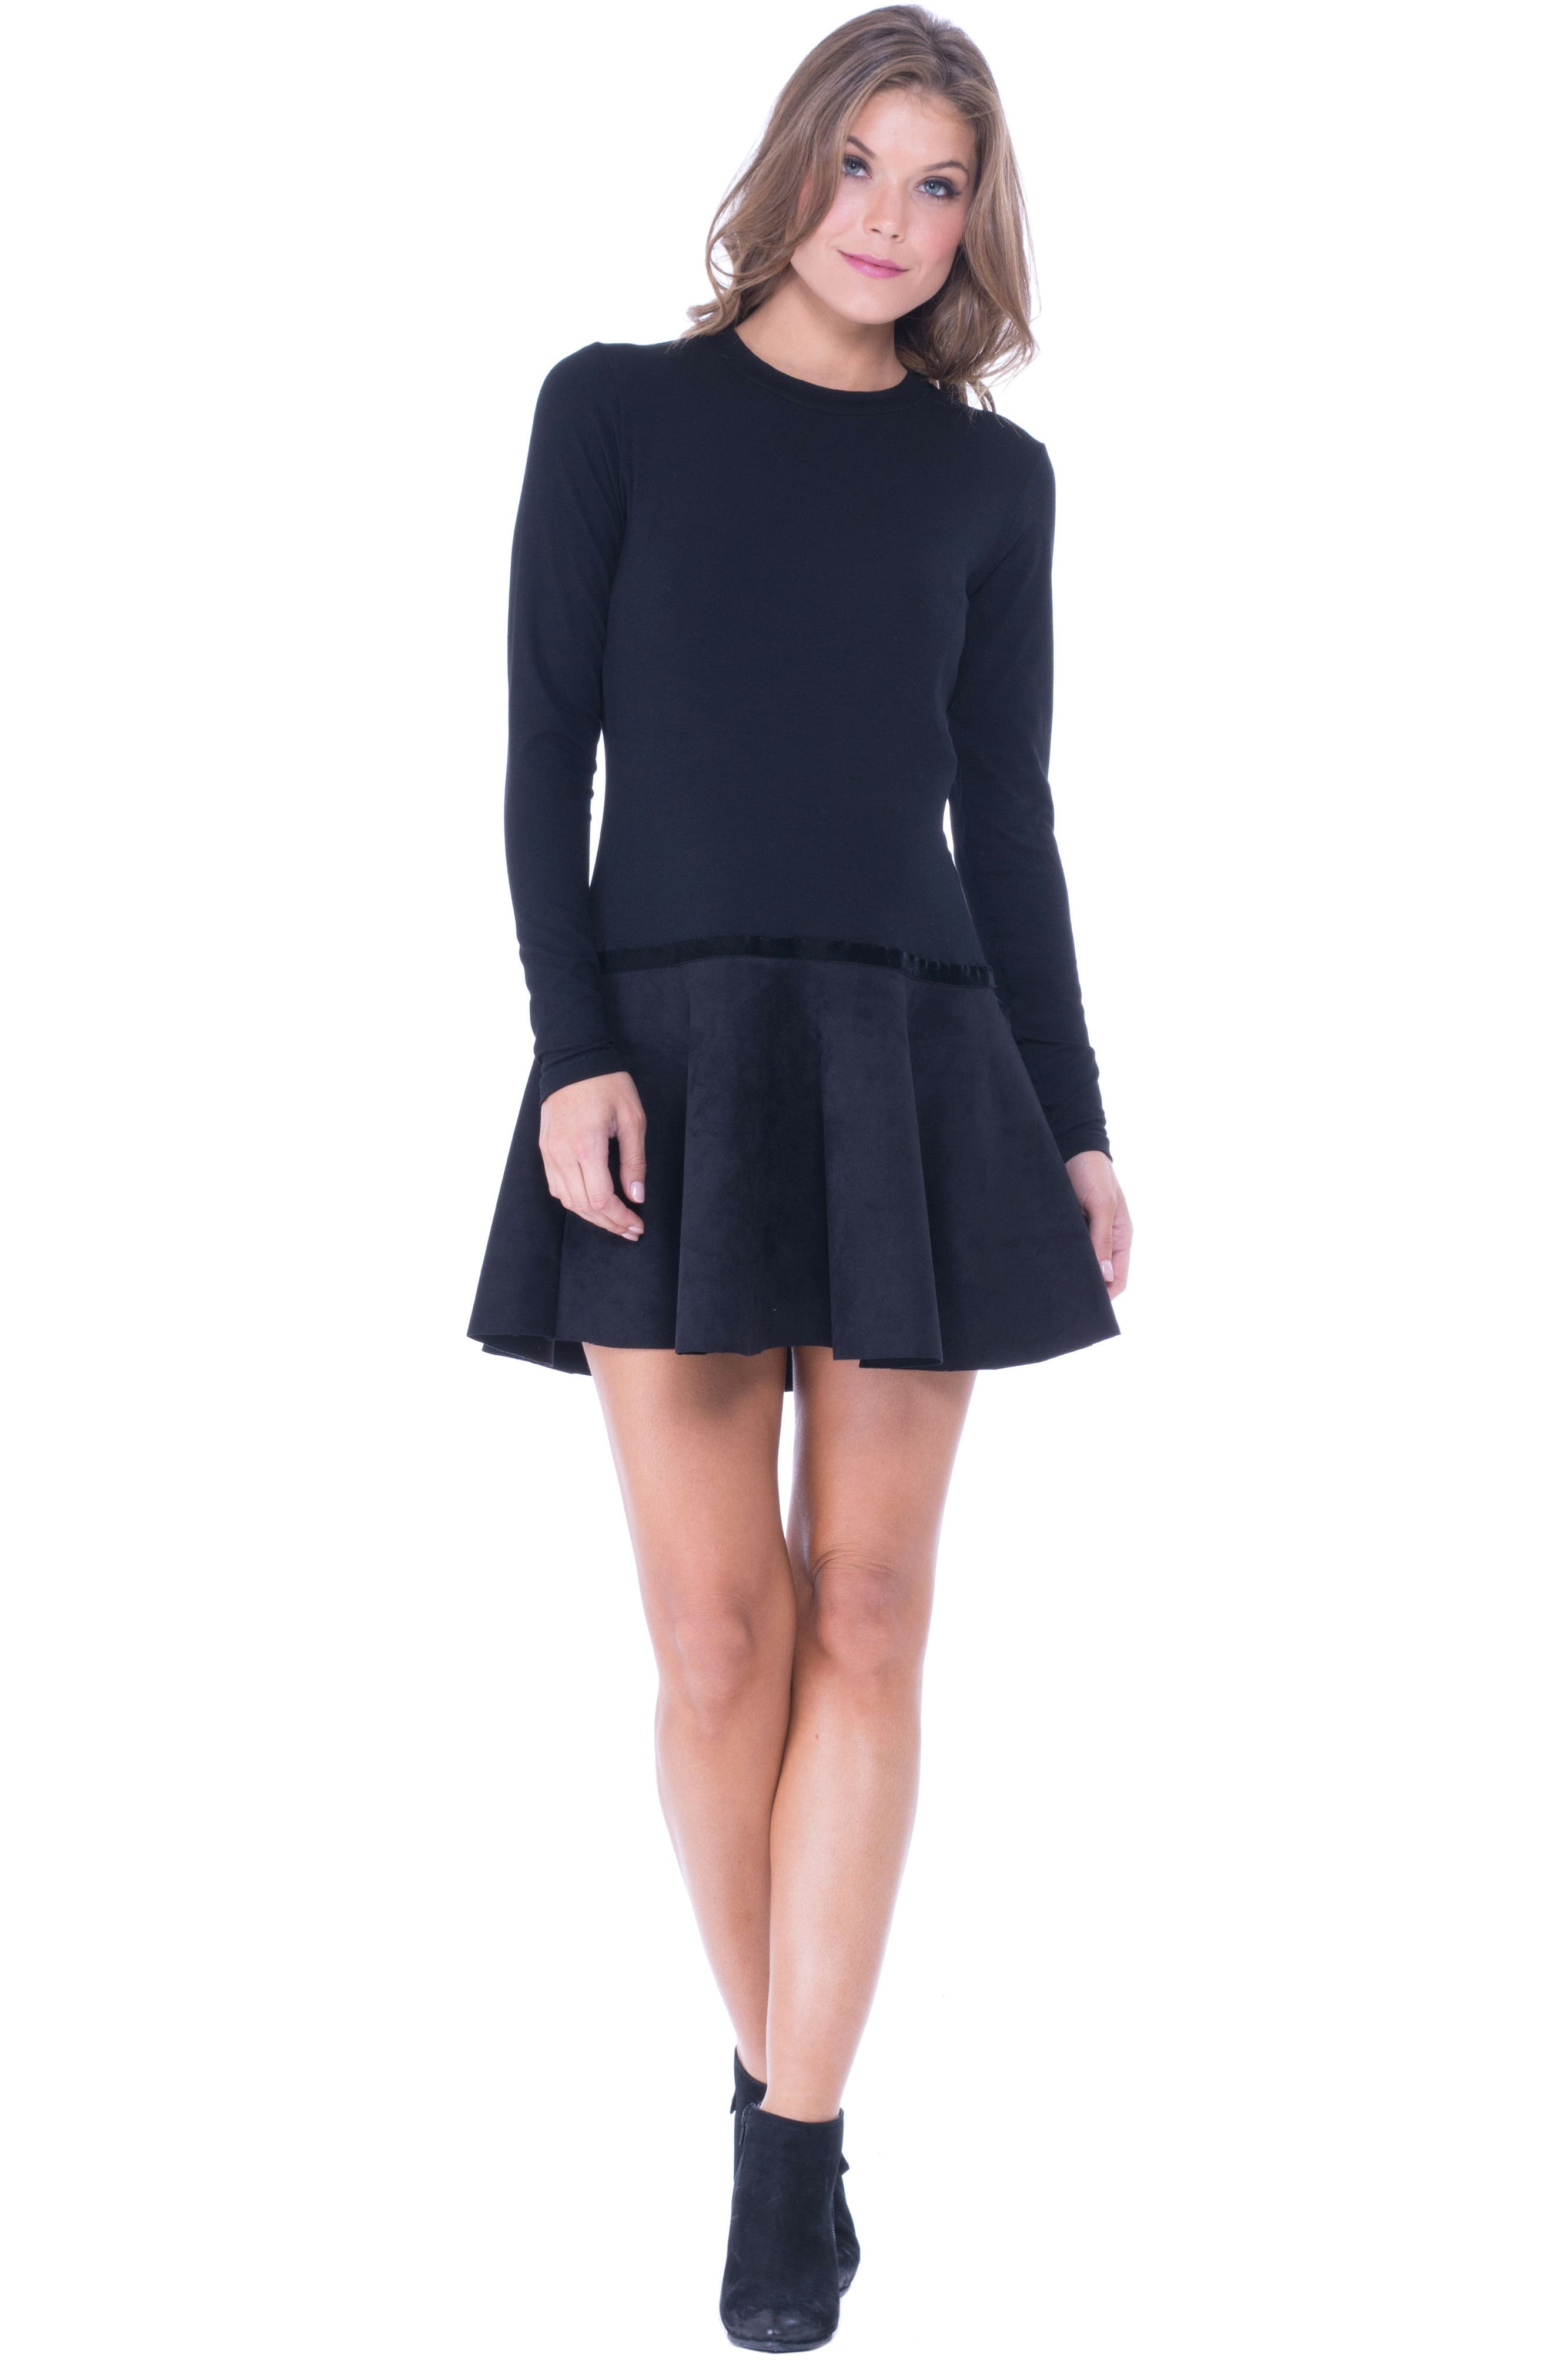 Faux Suede Skirt Maternity Skater Dress,                             Alternate thumbnail 4, color,                             BLACK